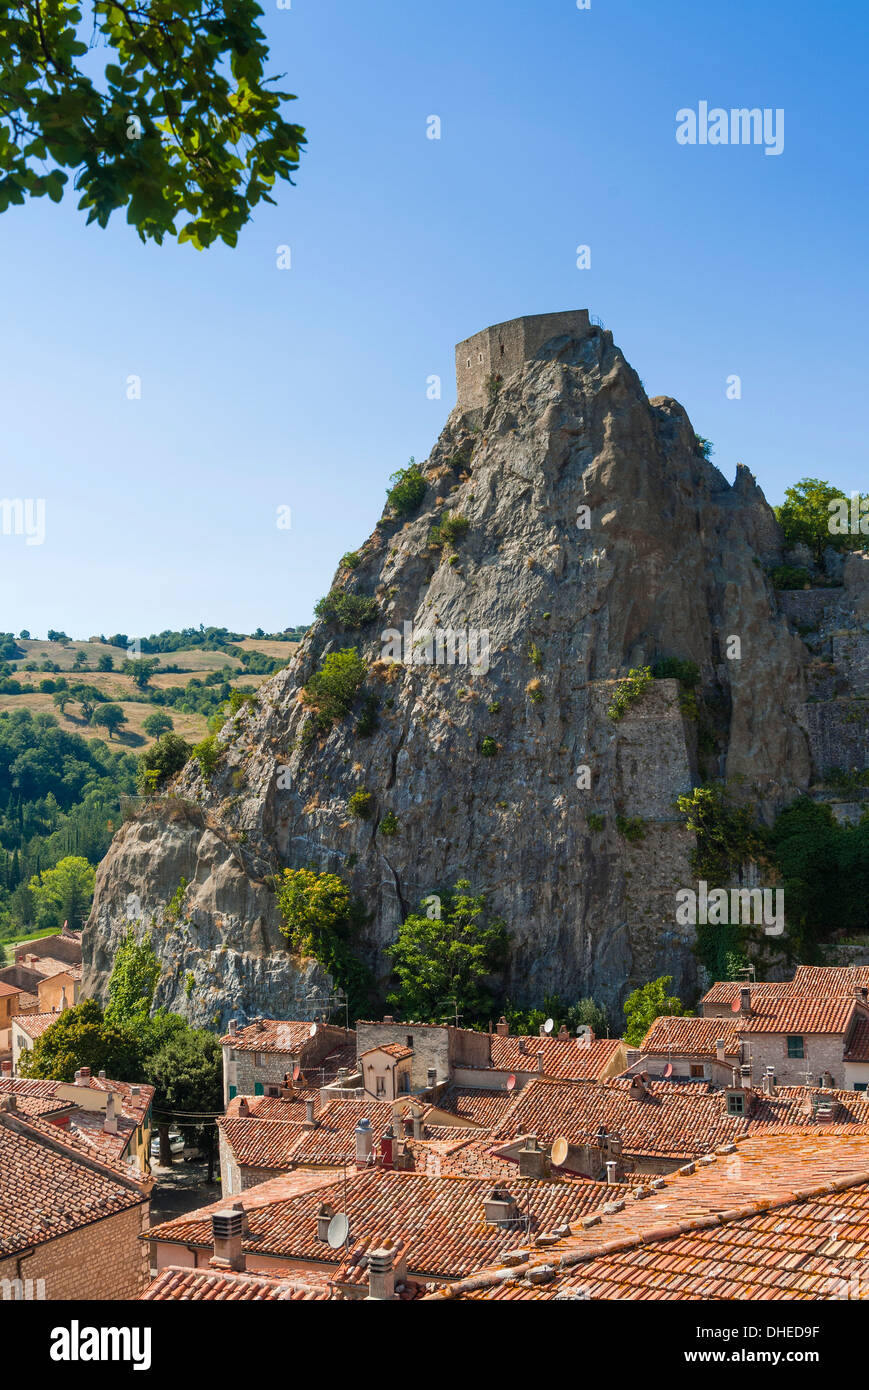 Rocca Aldobrandesca, Roccalbegna, Grosseto province, Tuscany, Italy, Europe - Stock Image